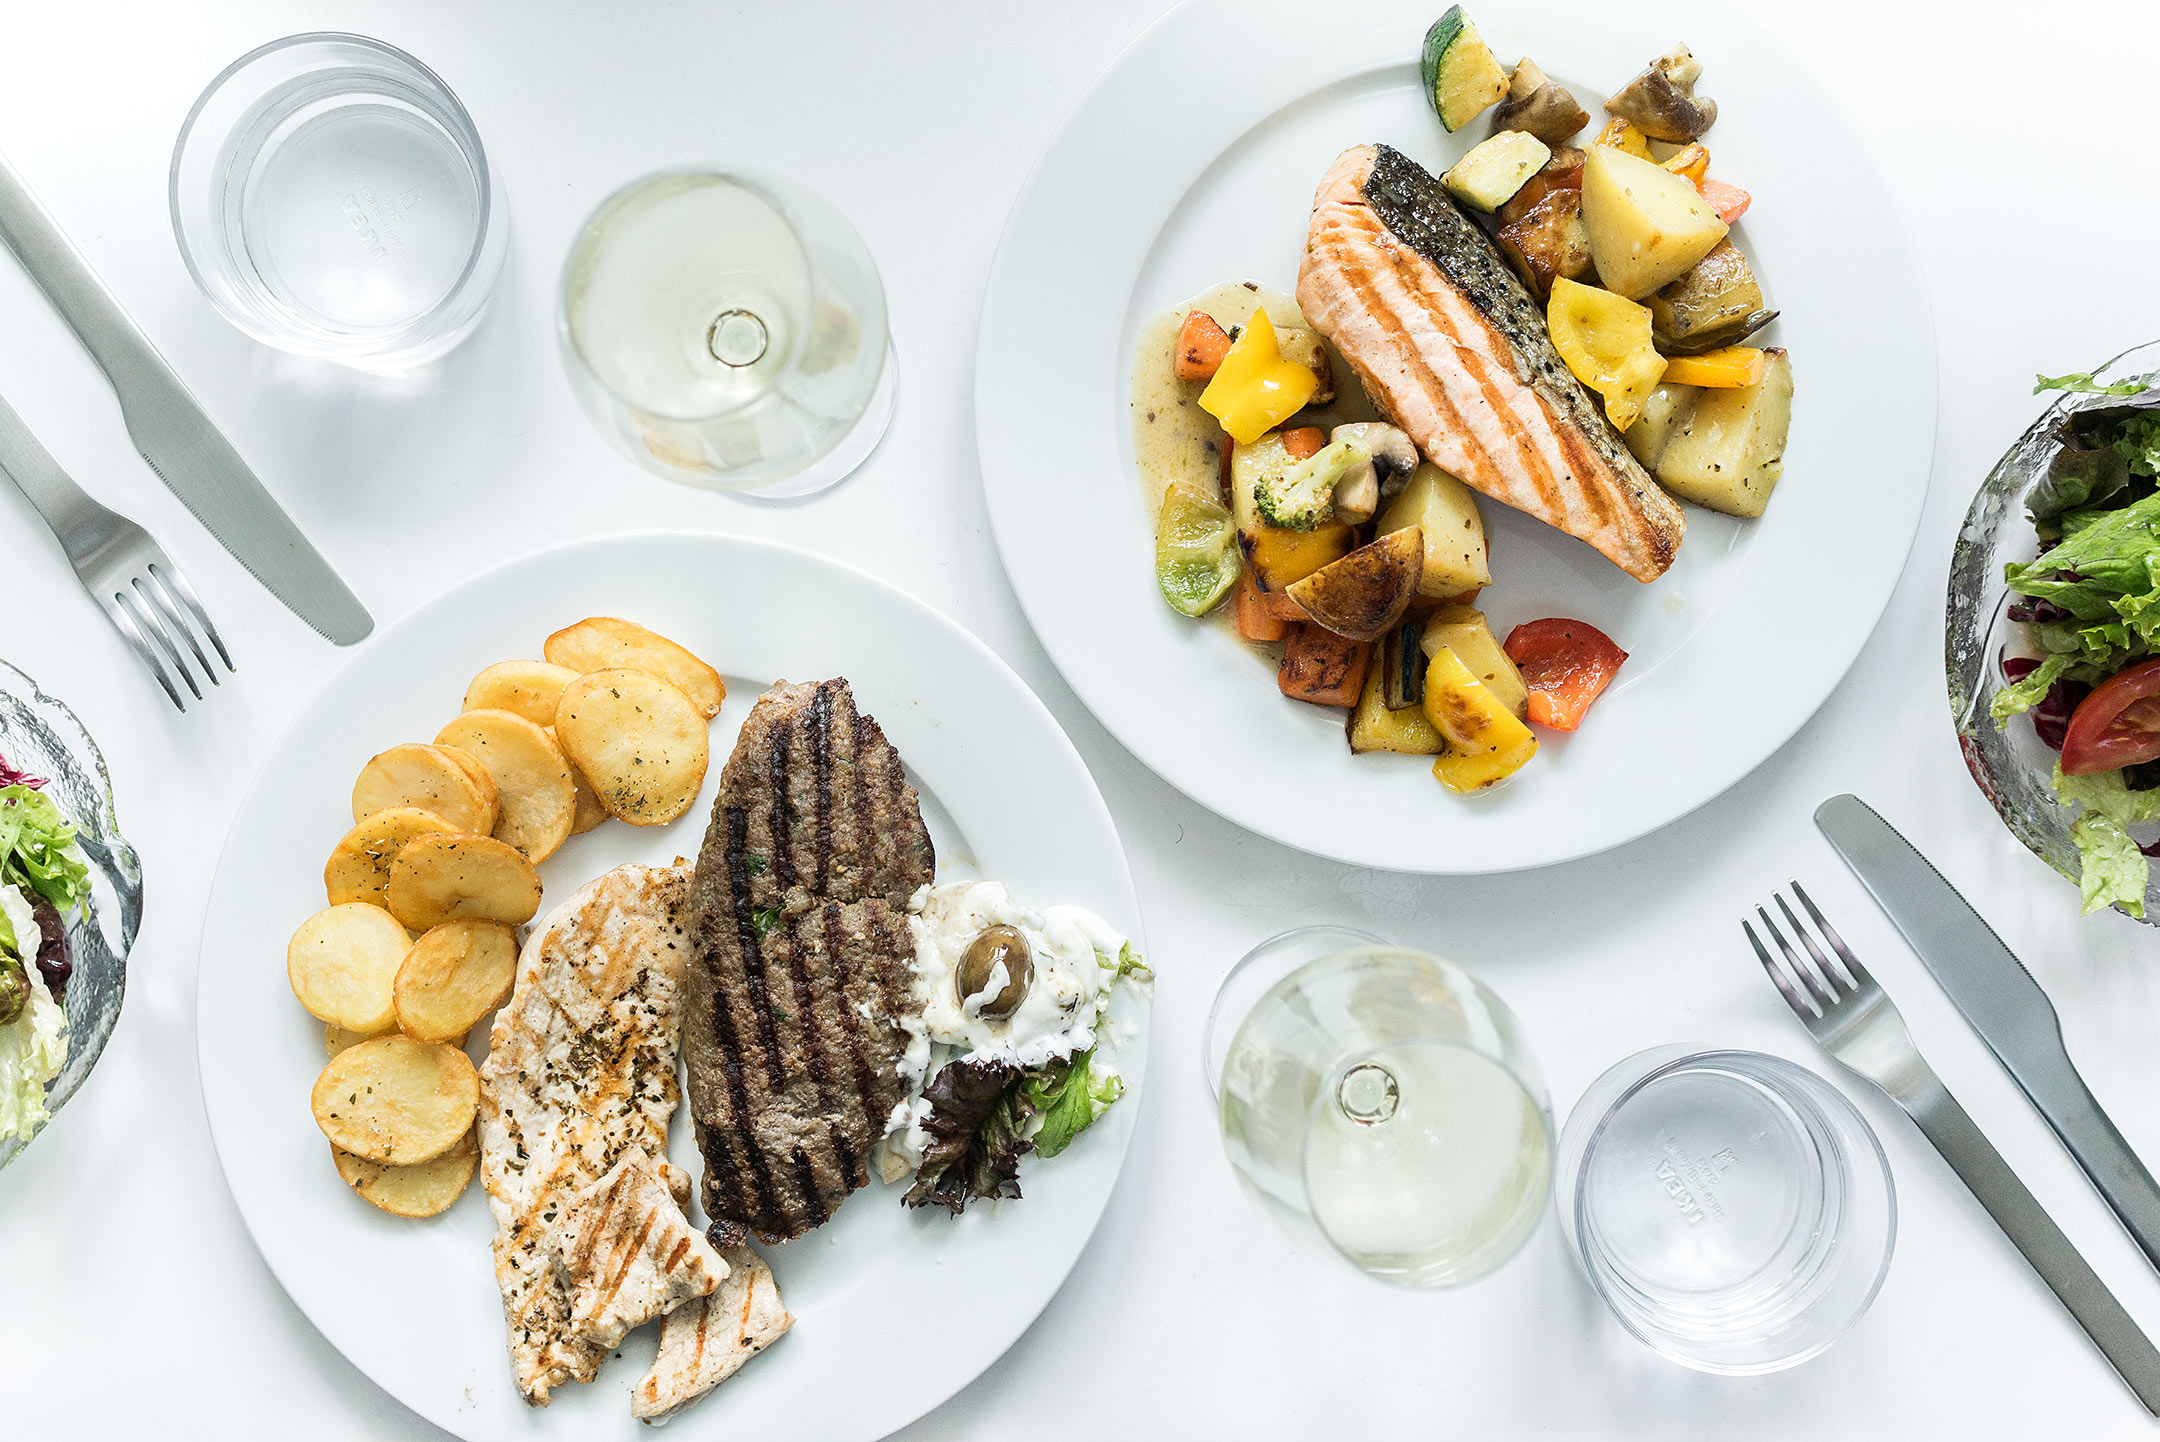 Kostas Grieche Düsseldorf Lorettostrasse Foodora Sunnyinga Lifestyle Blog